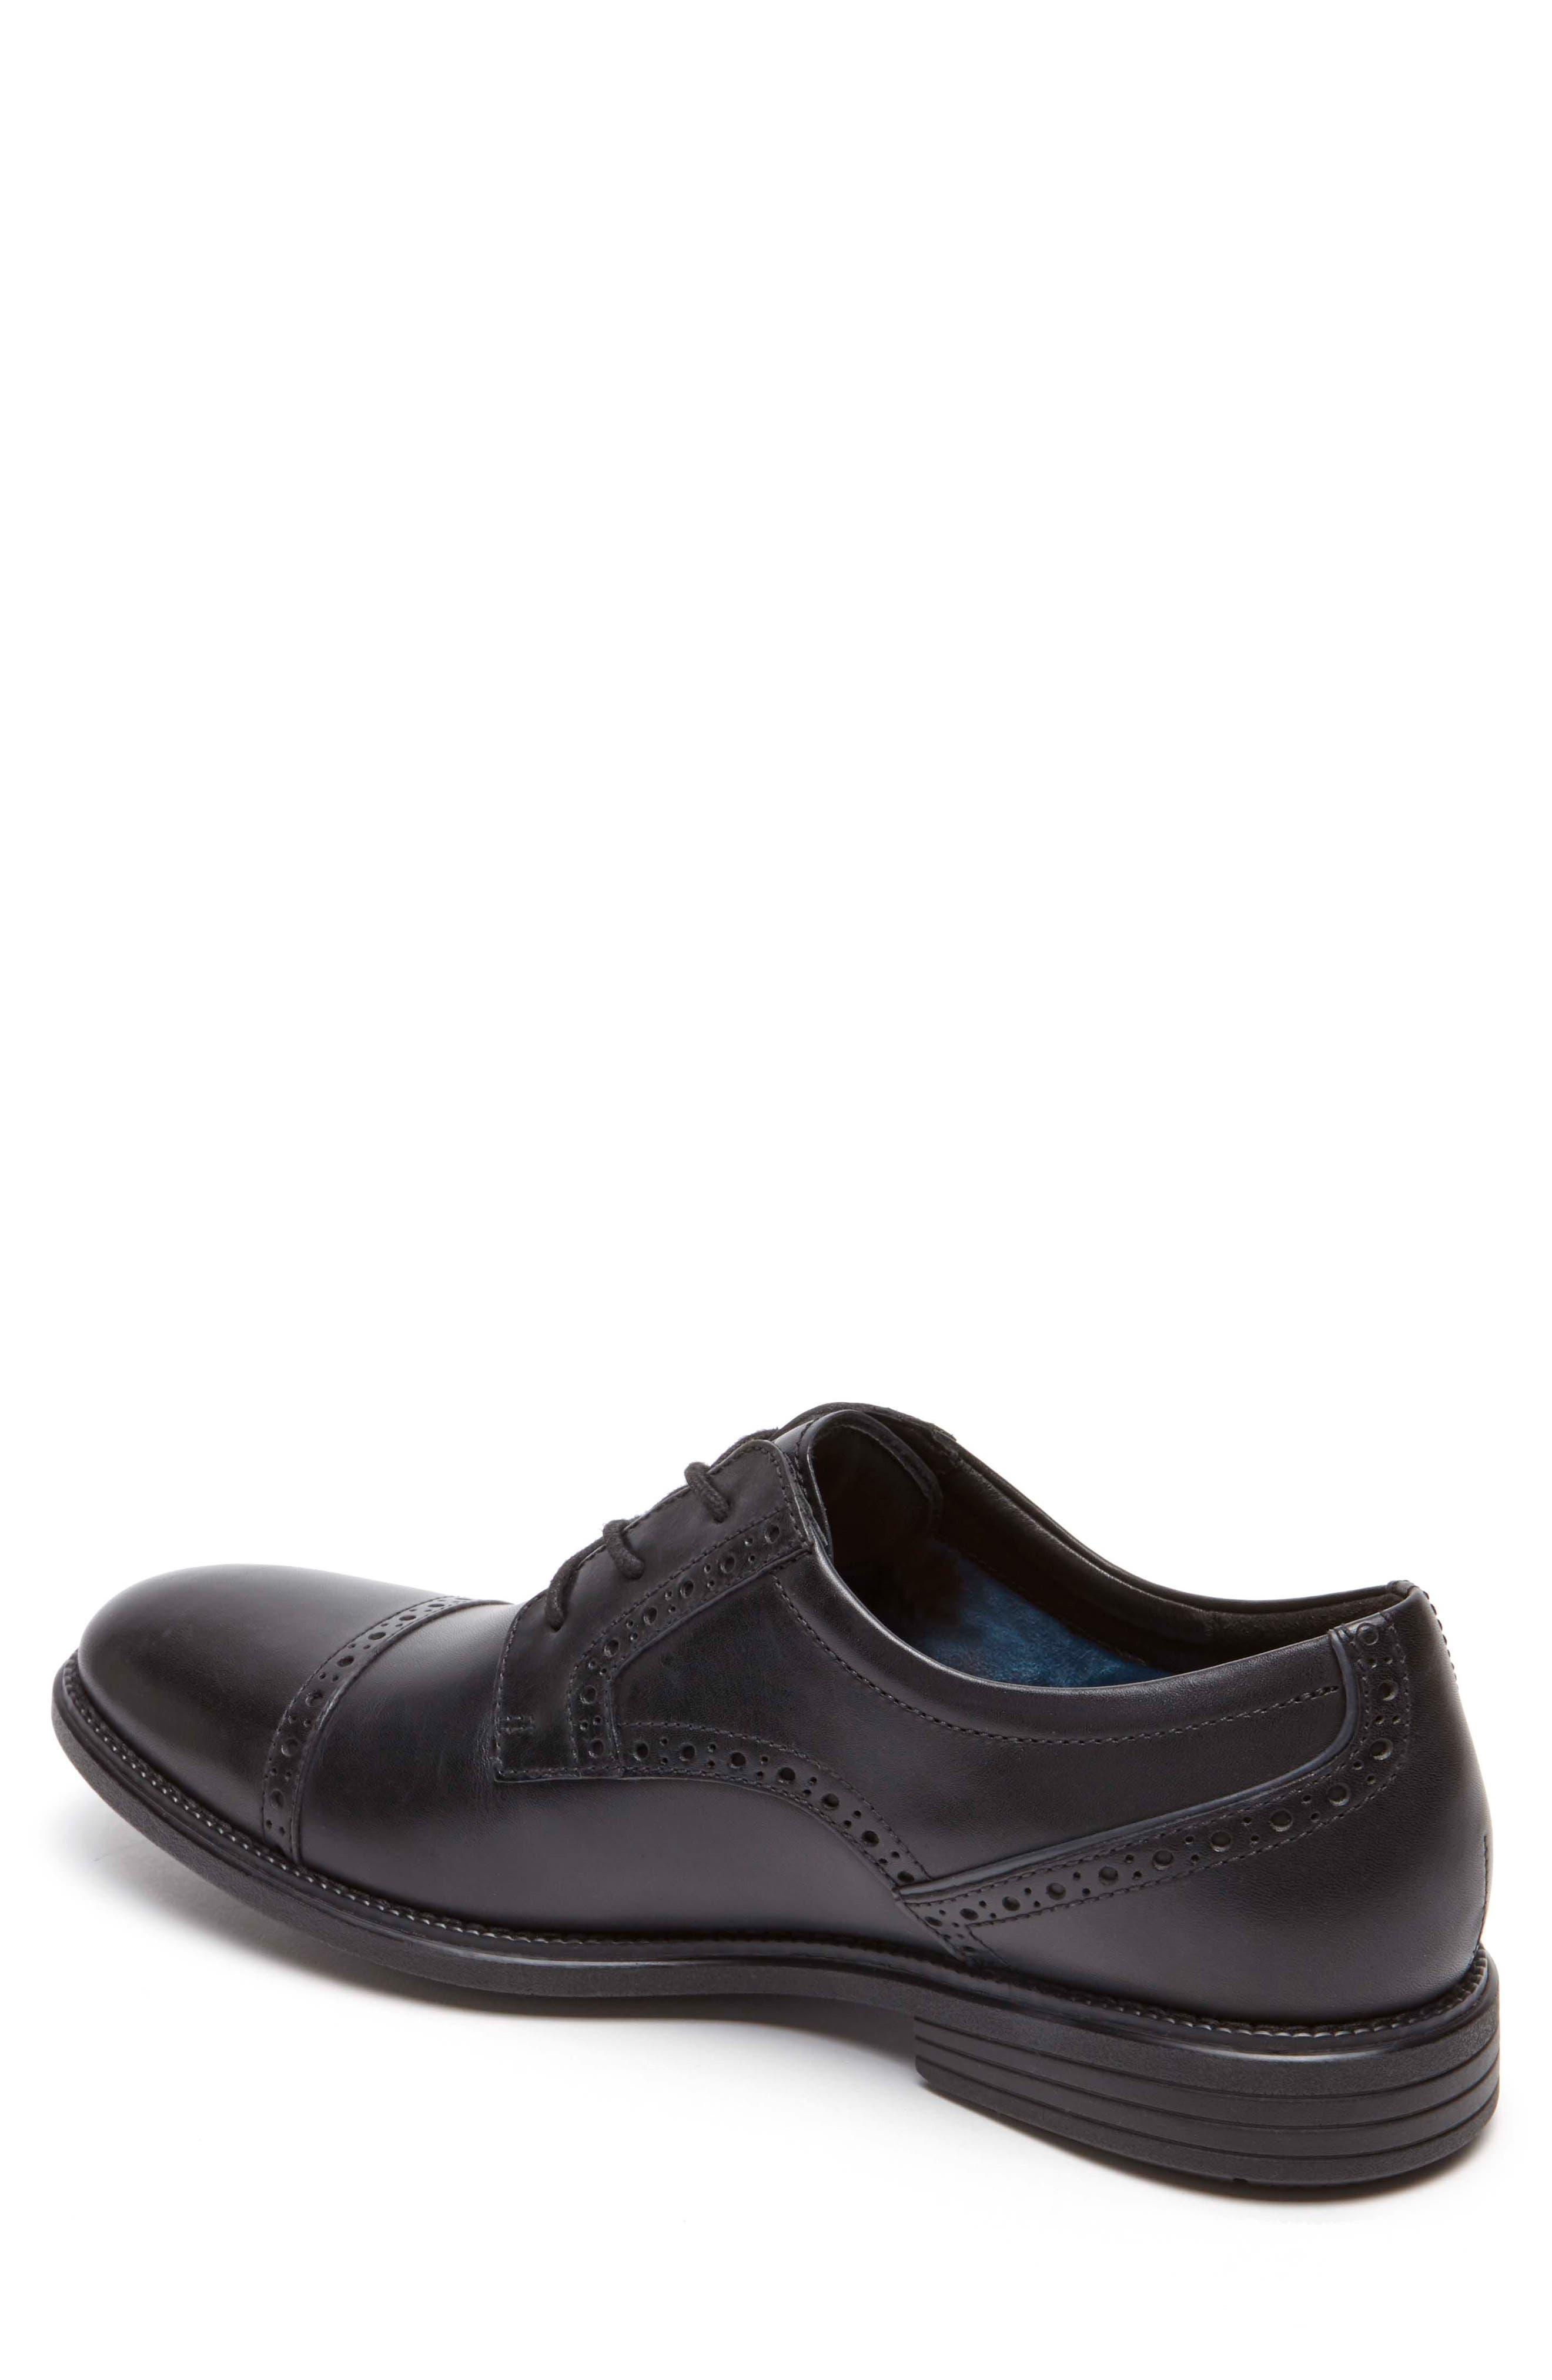 Madson Cap Toe Derby,                             Alternate thumbnail 2, color,                             Black Leather